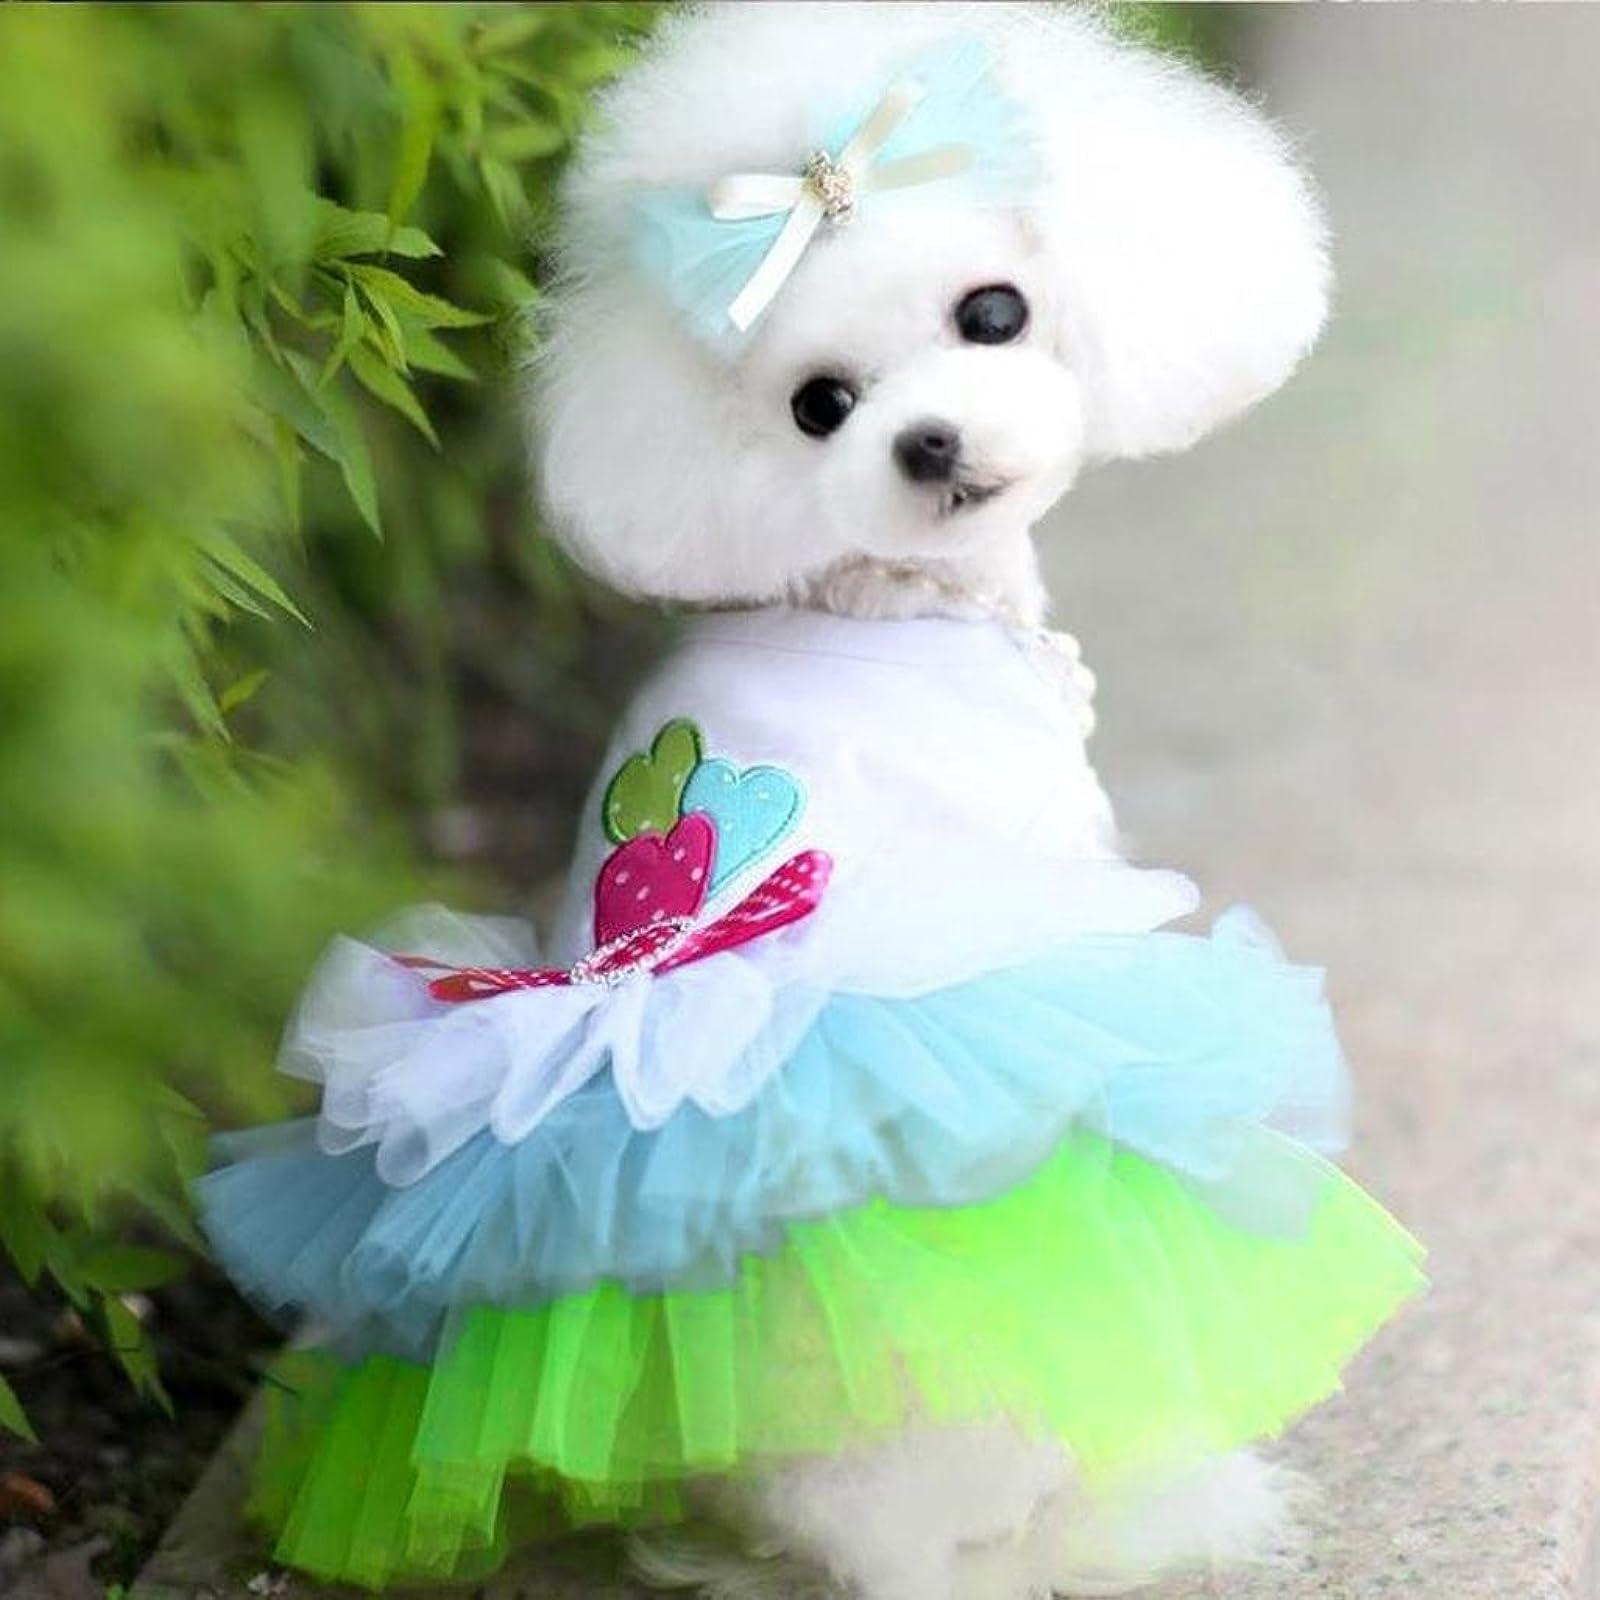 OutTop Girl Dog Dress Lace Princess Tutu WSM60224084S_YD - 5